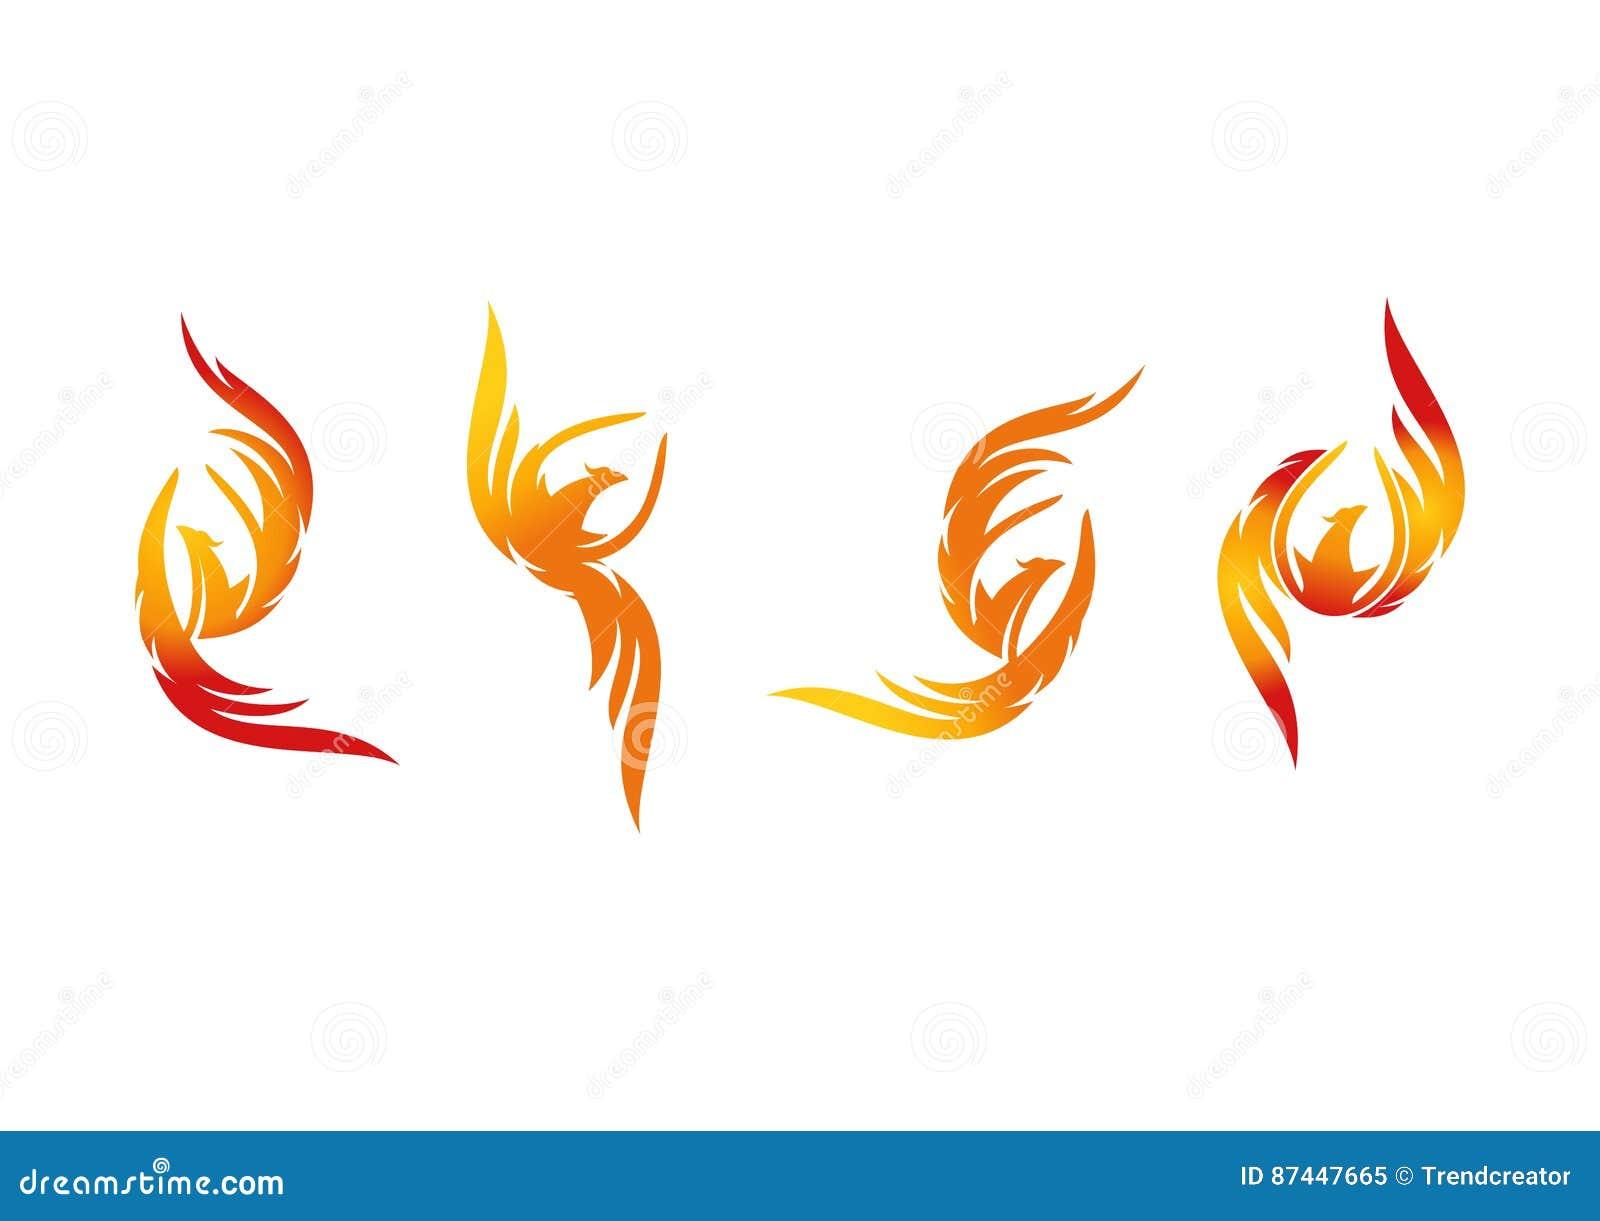 Phoenix, logo, flame, icon, and fire bird concept design